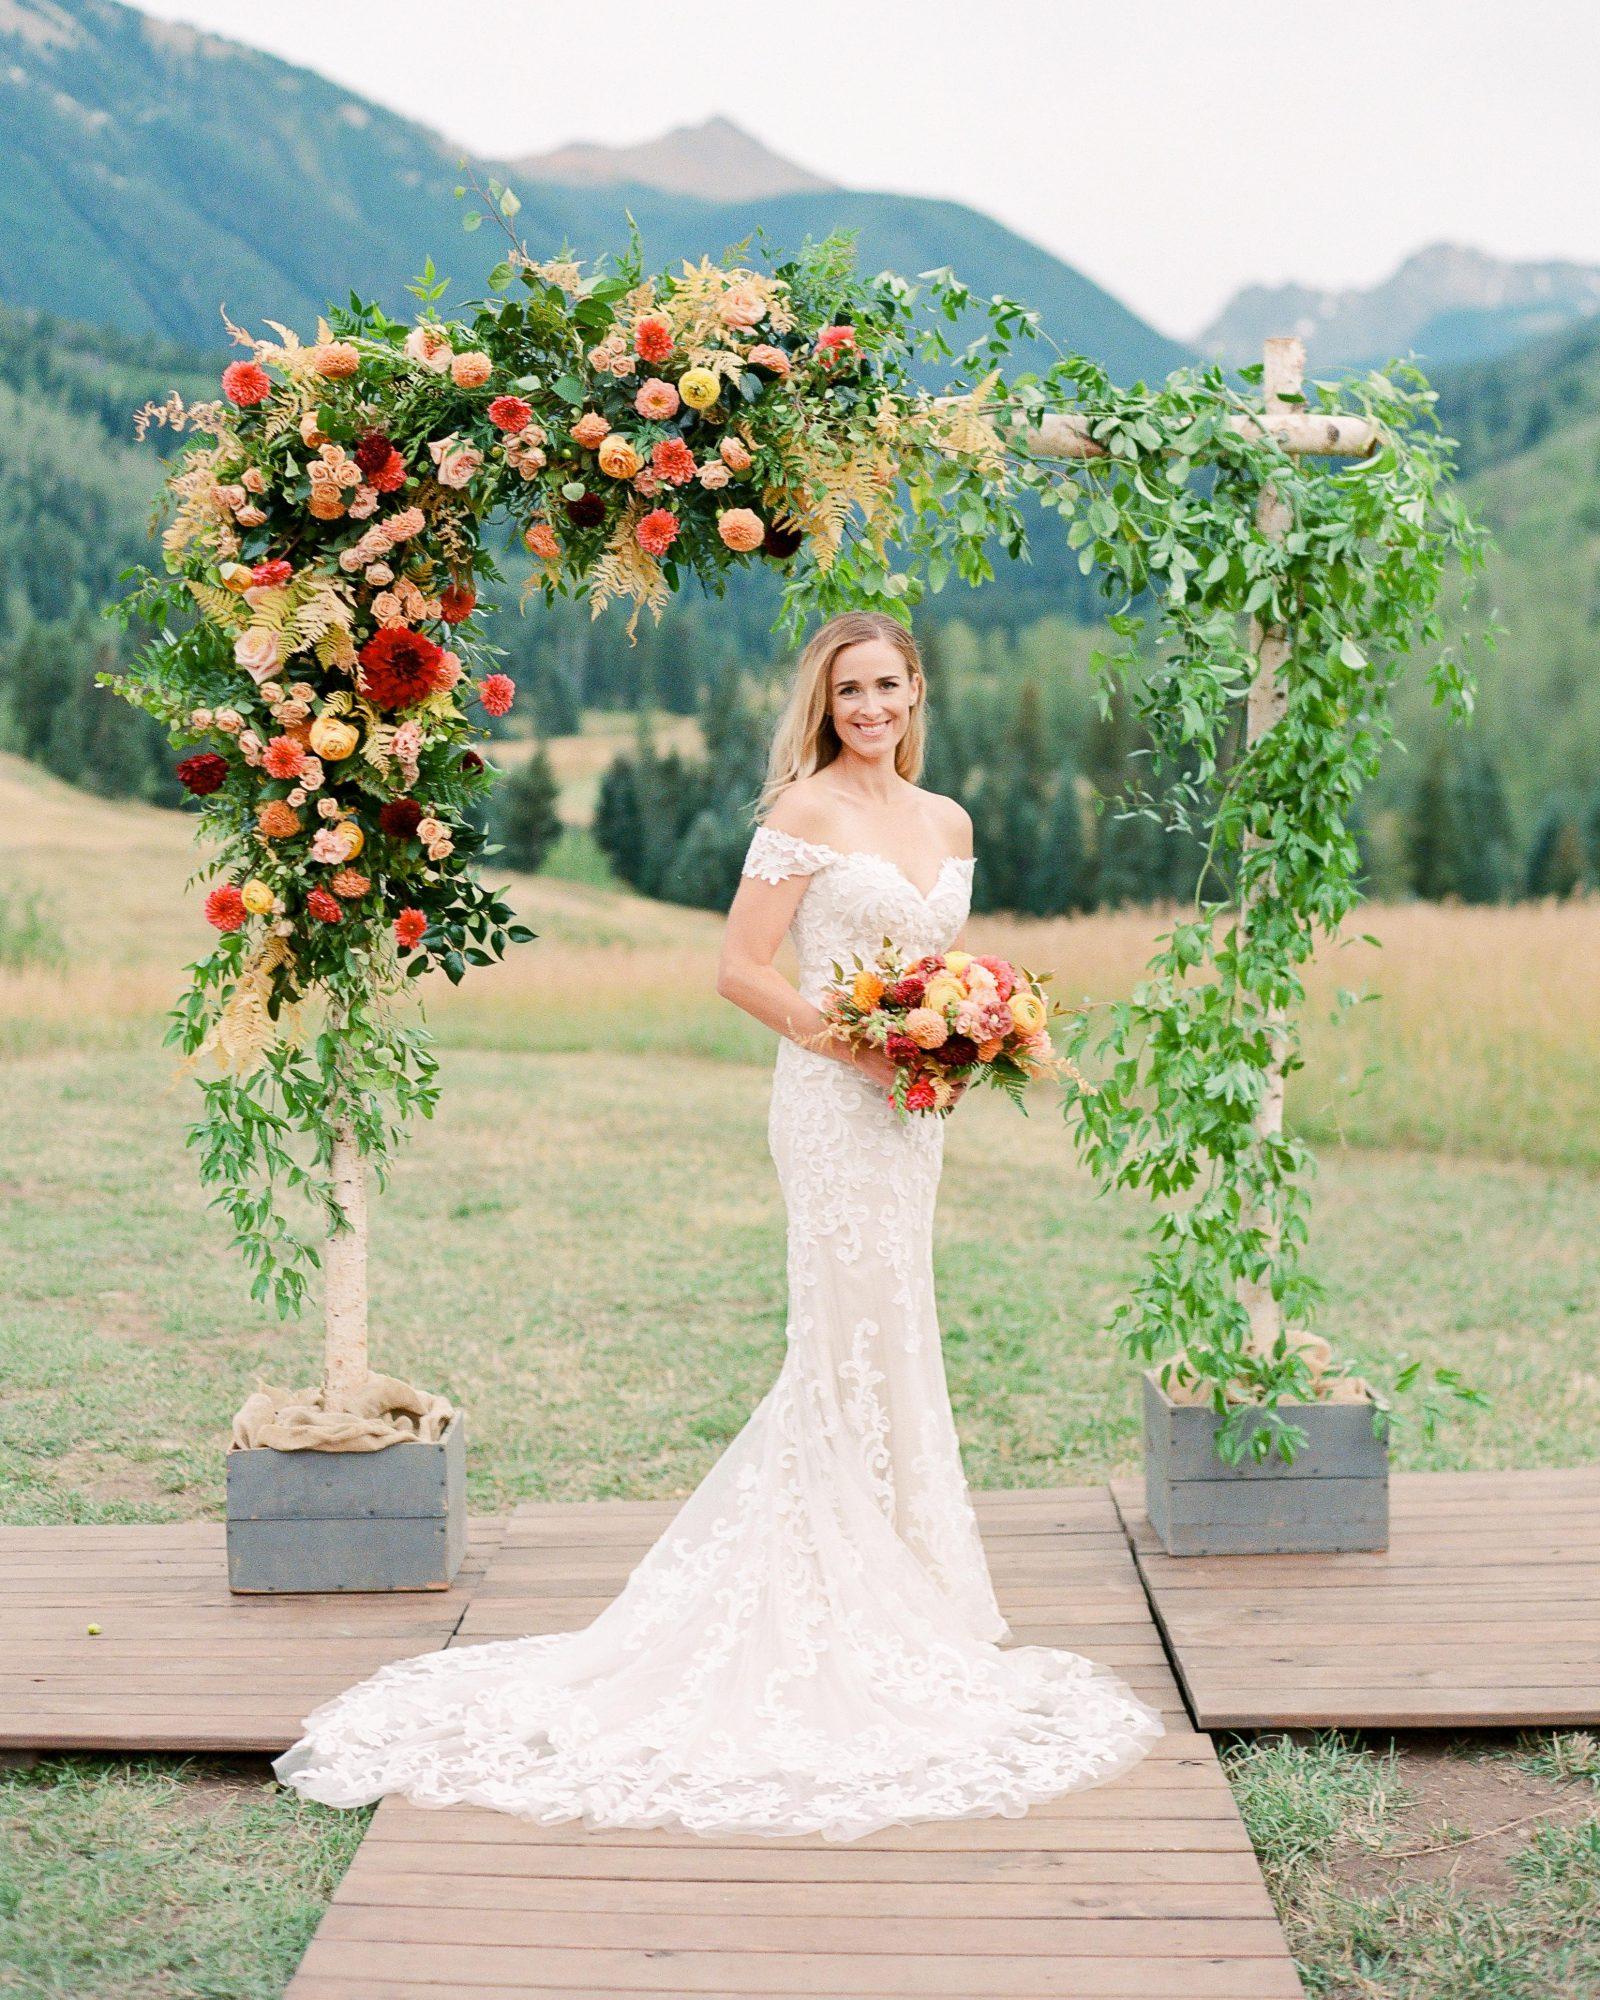 jill phil wedding bride solo portrait under floral ceremony arch